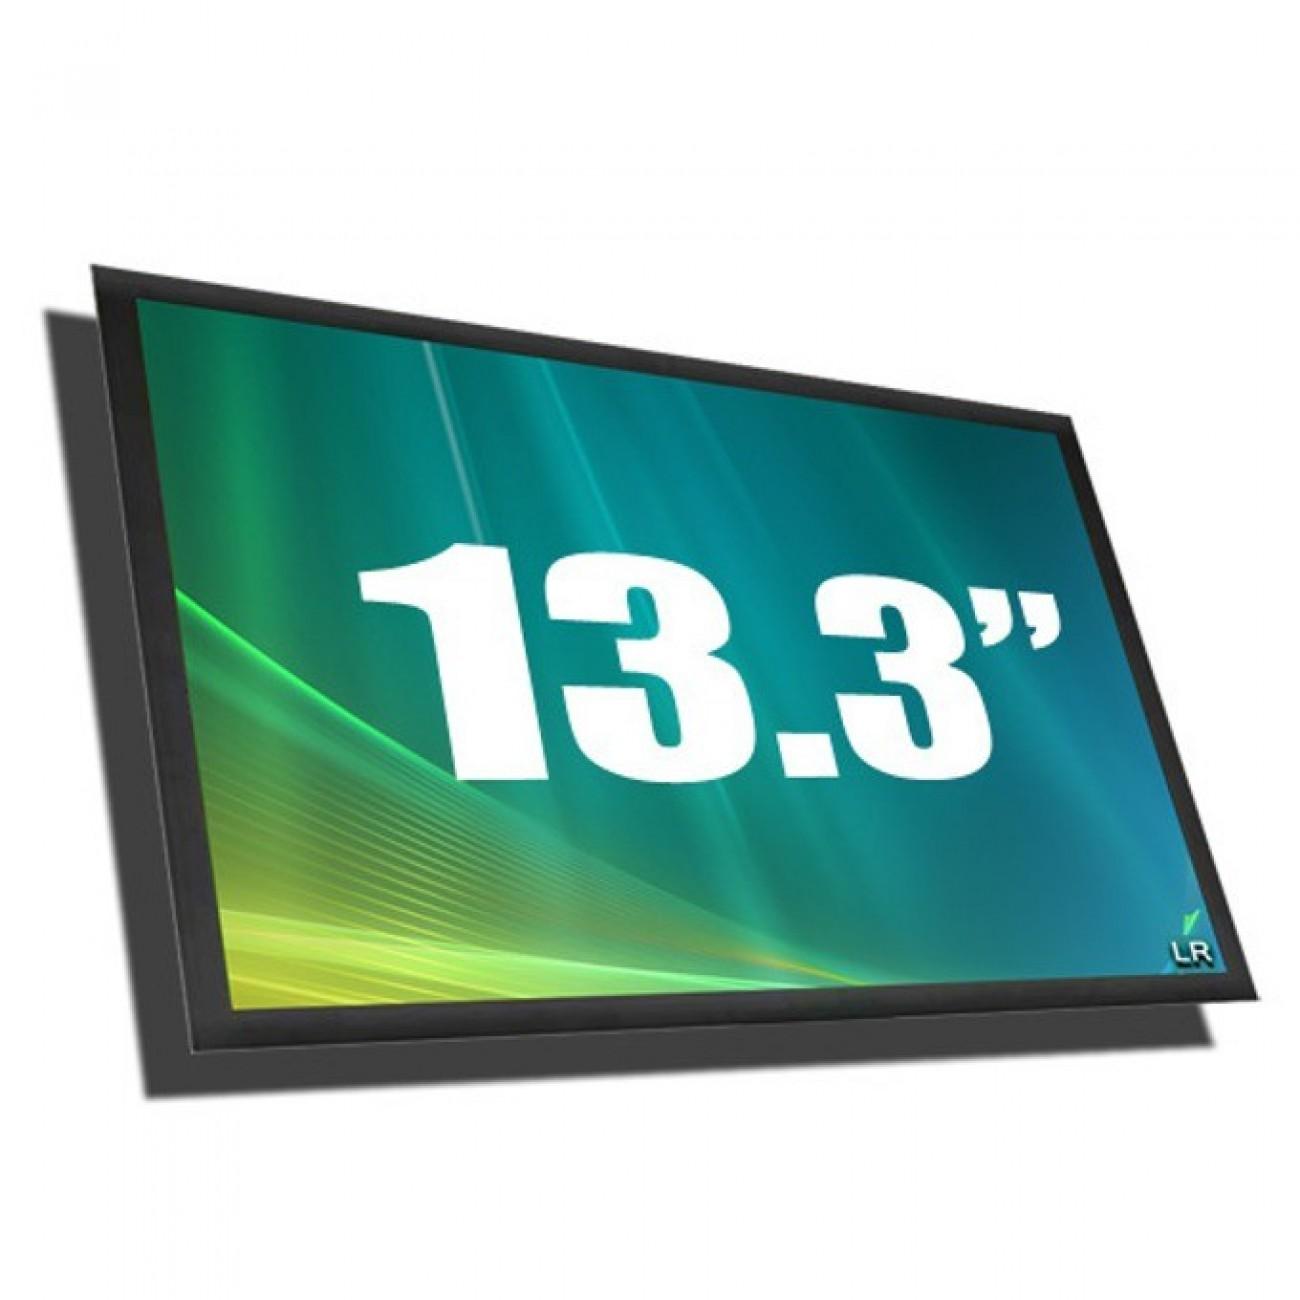 Матрица за лаптоп Samsung LTN133AT23-801, 13.3(33.78 cm), WXGAP+ 1366:768 pix., матов в Резервни части -  | Alleop